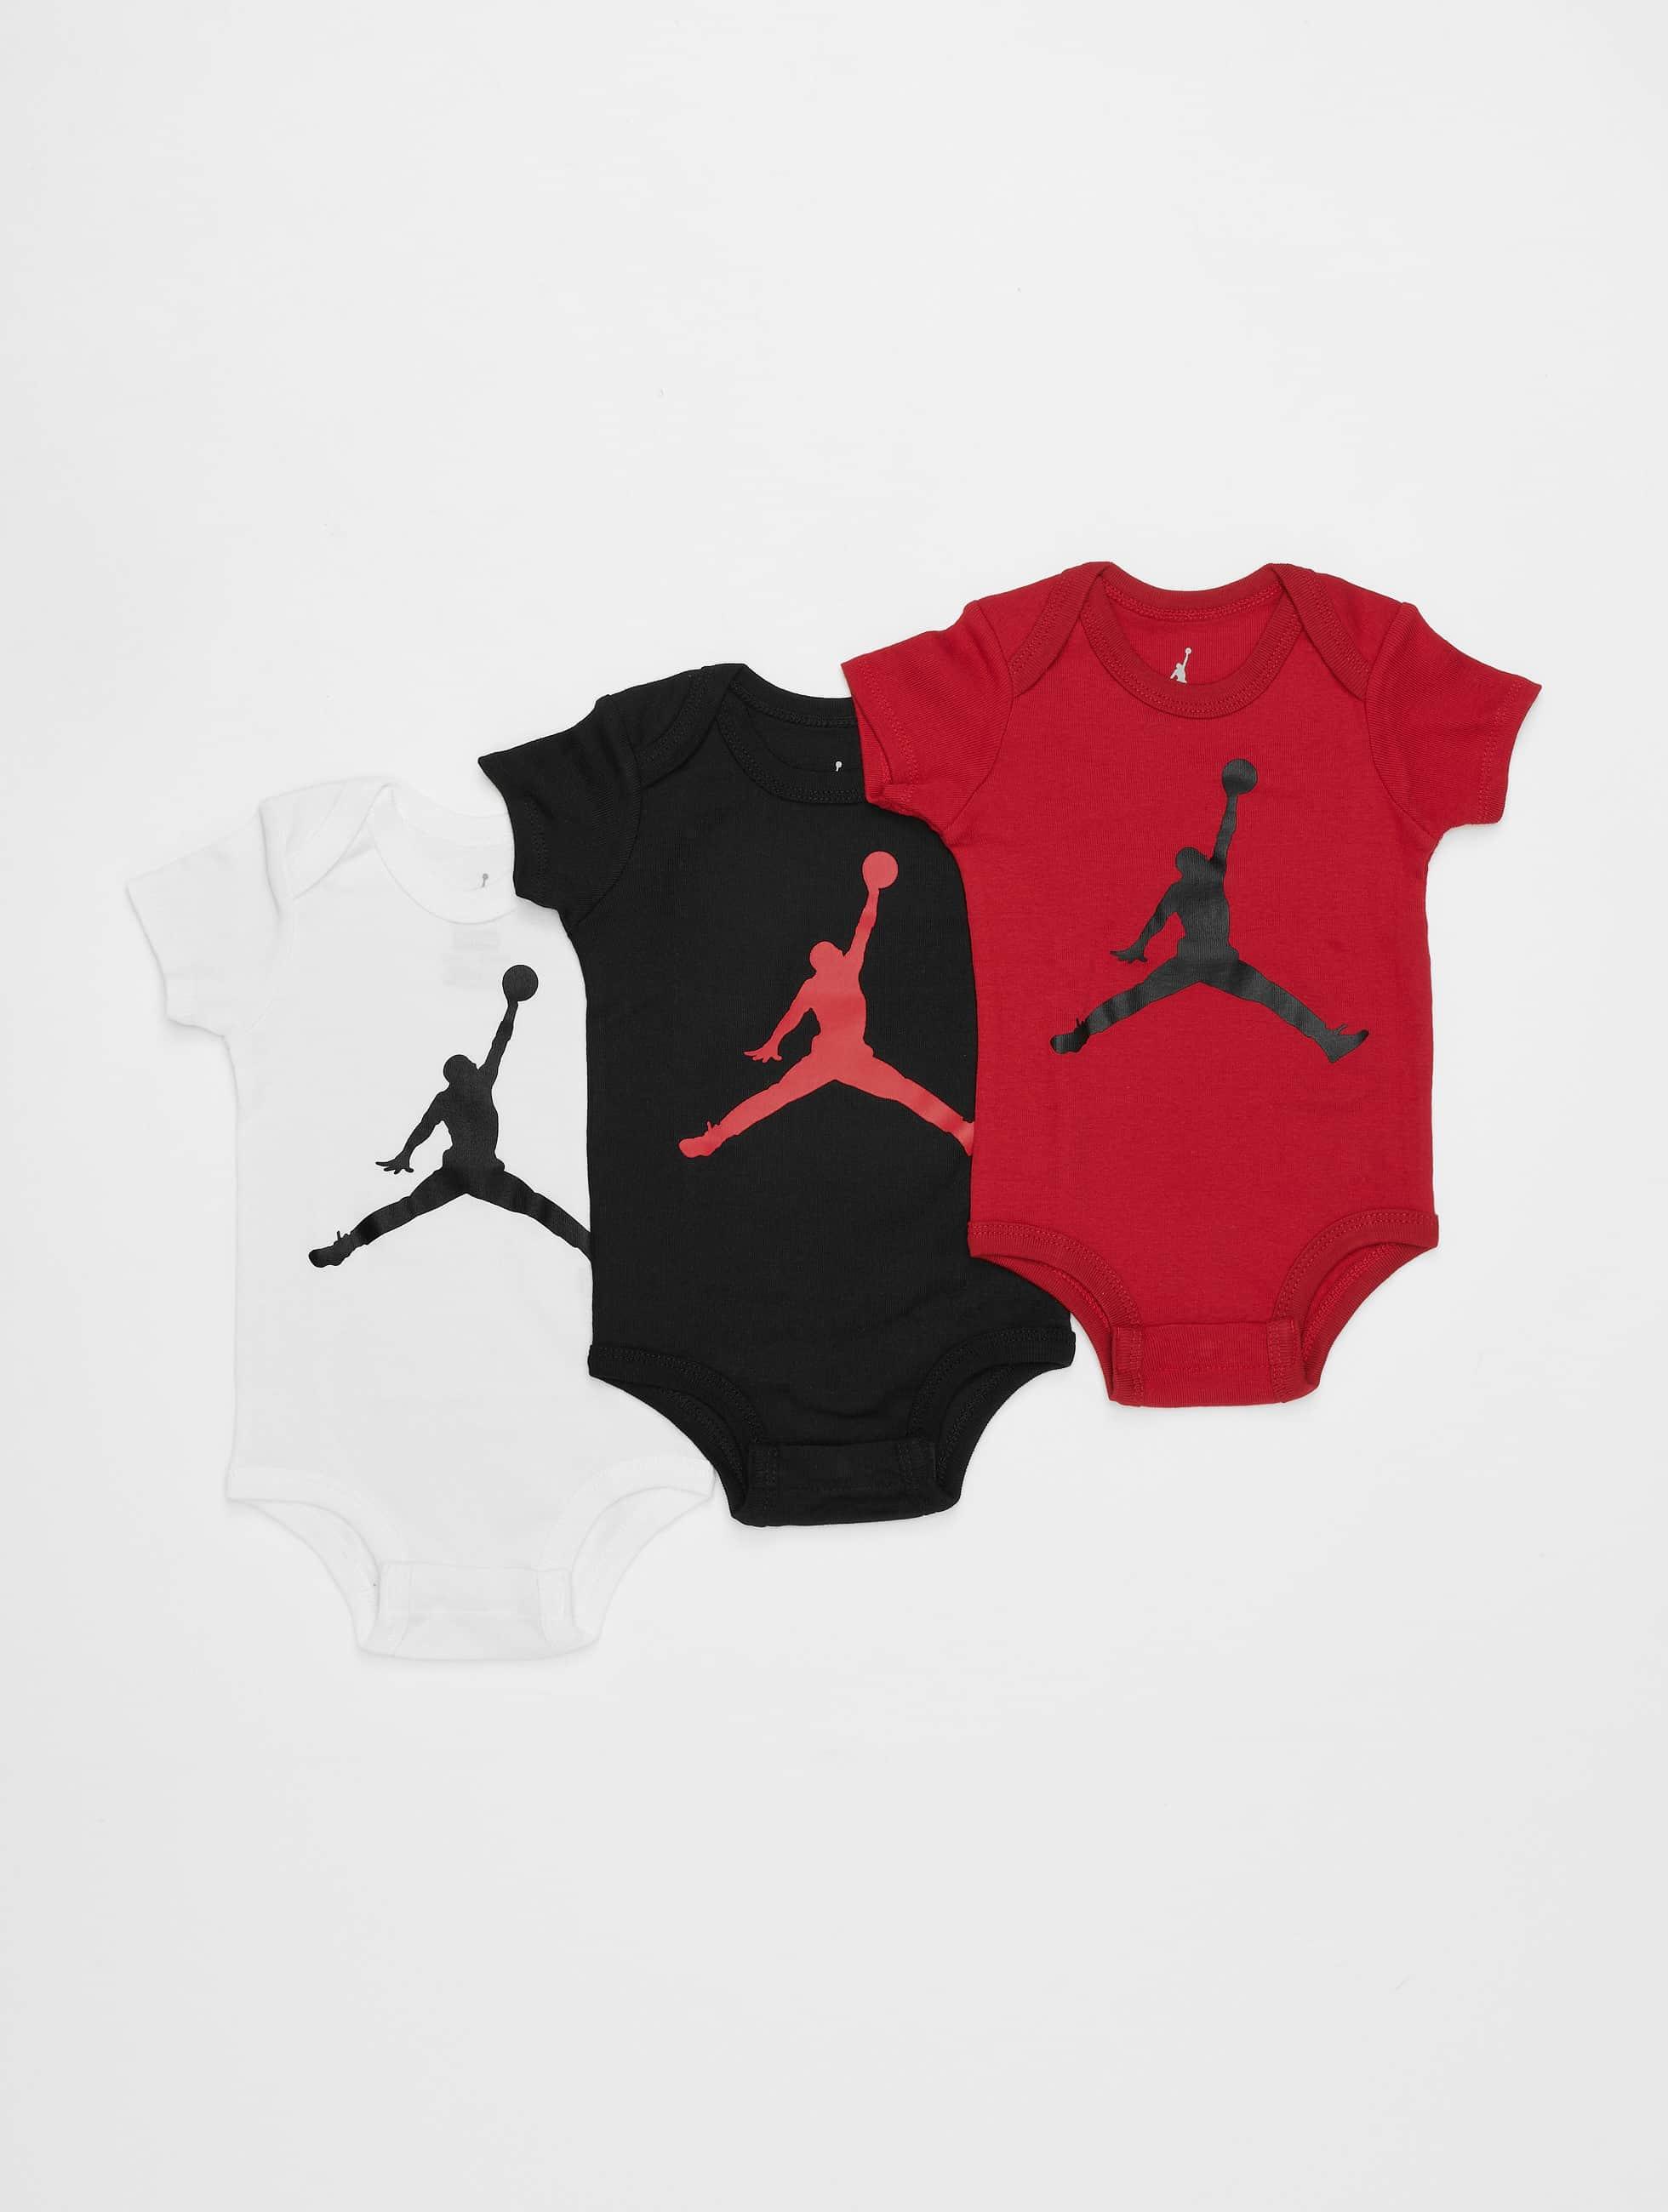 Jordan | 3-Pack Jumpman noir Enfant Body